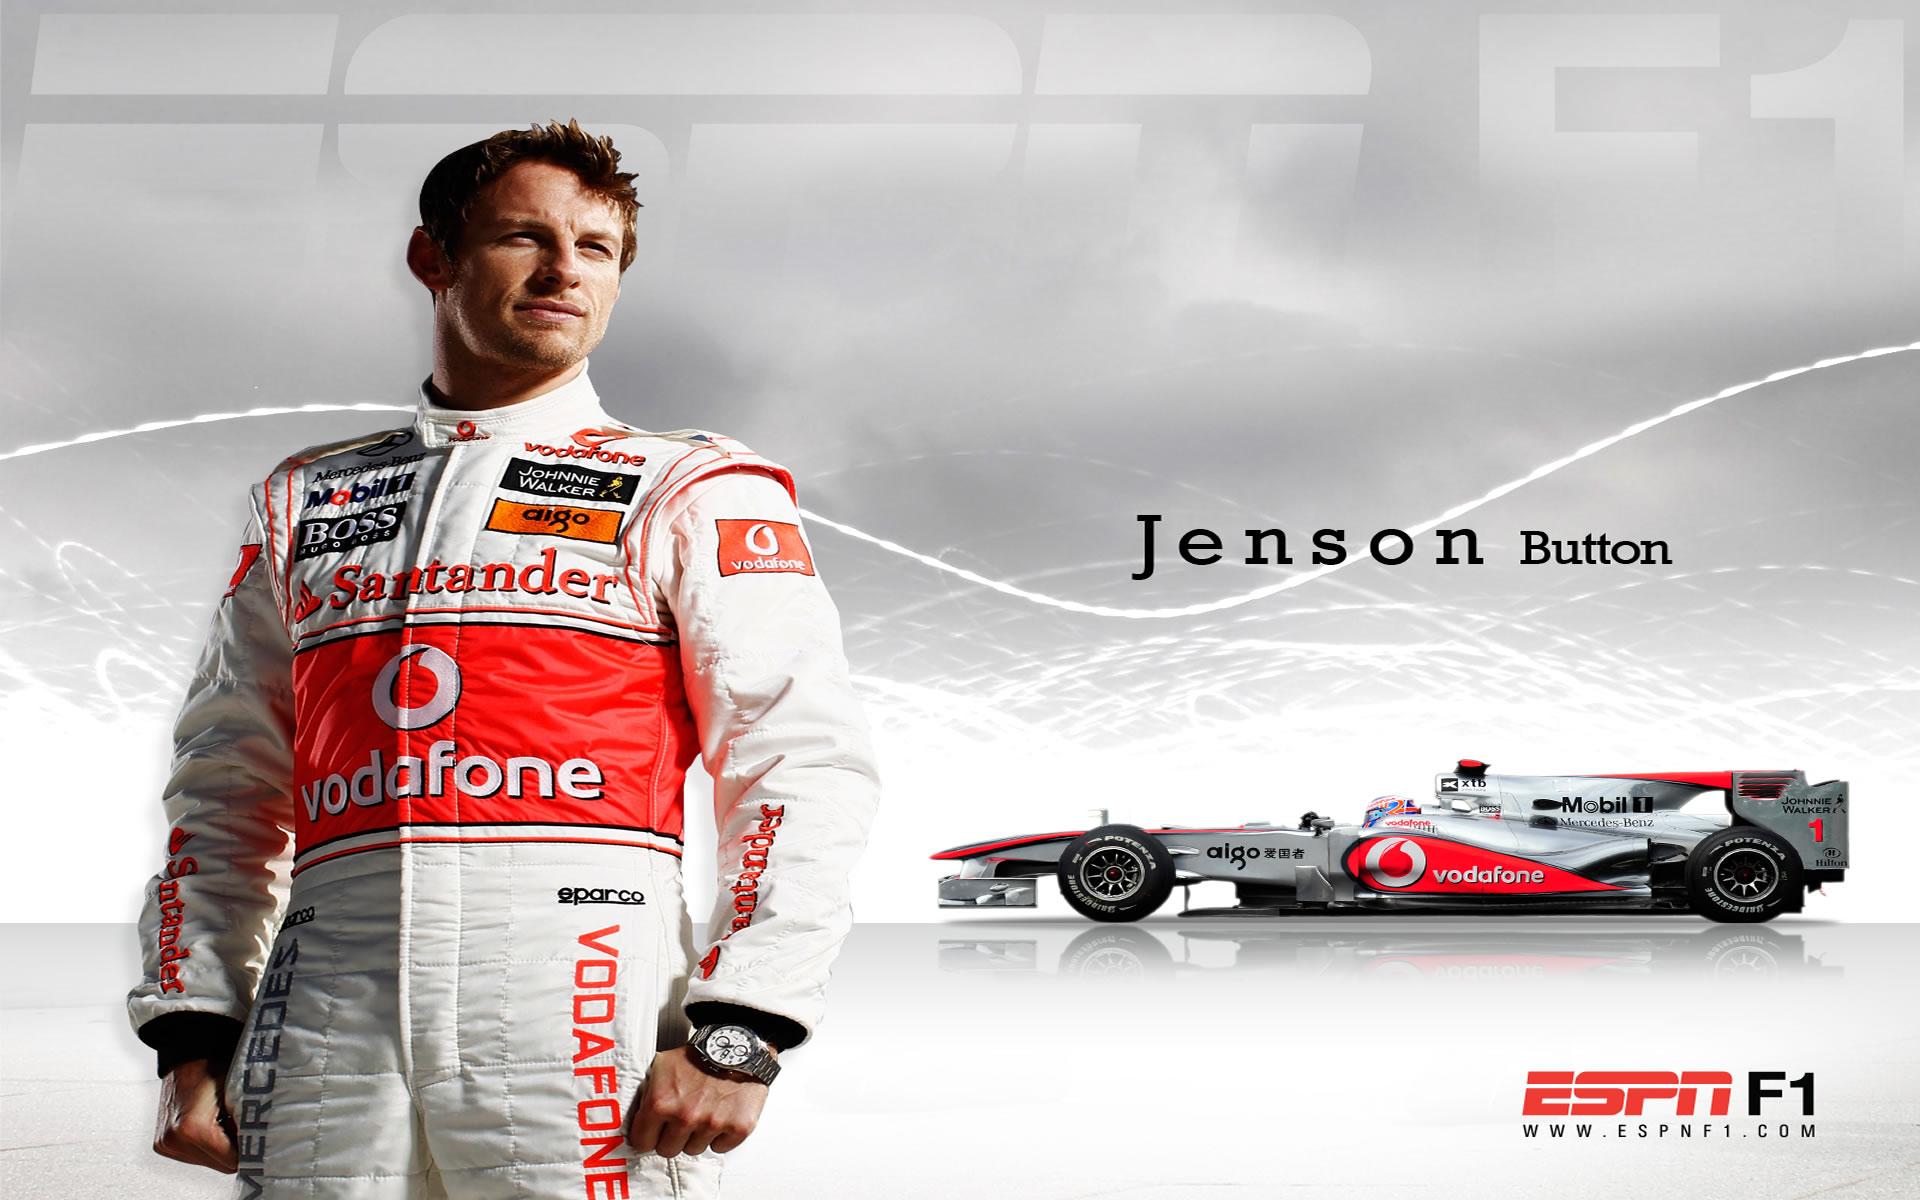 Jenson Button Wallpapers Fórmula 1